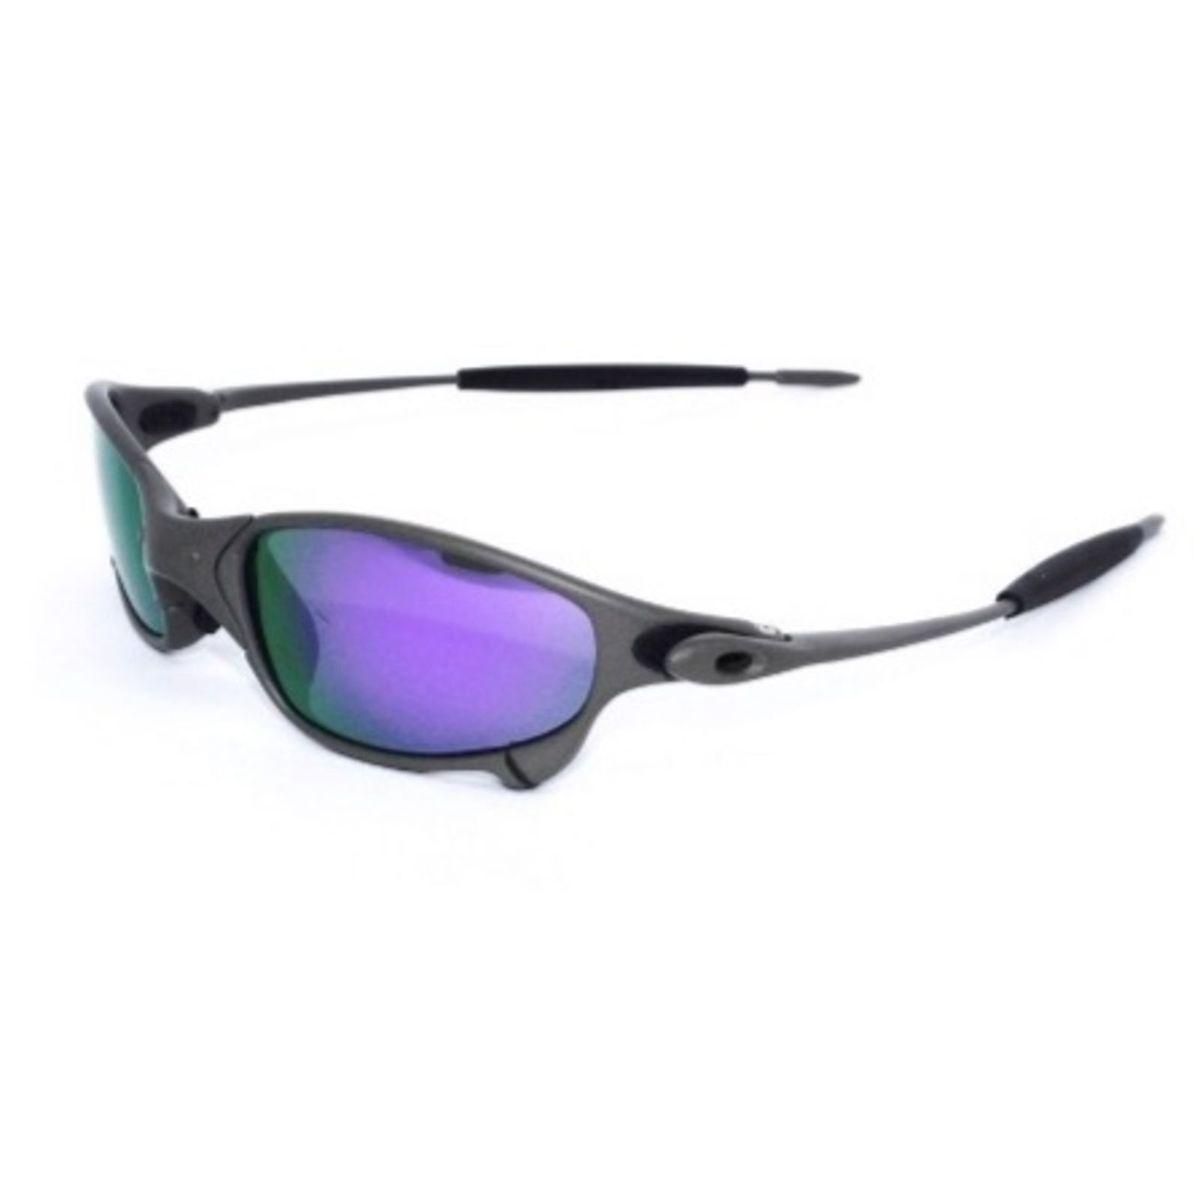 óculos oakley juliet 24k - óculos oakley.  Czm6ly9wag90b3muzw5qb2vplmnvbs5ici9wcm9kdwn0cy84nzm3ndkzlzmzmtdkzjm0mti5ote0yjm0mdhingrkzmvimtixntc2lmpwzw  ... 3c132fdce3